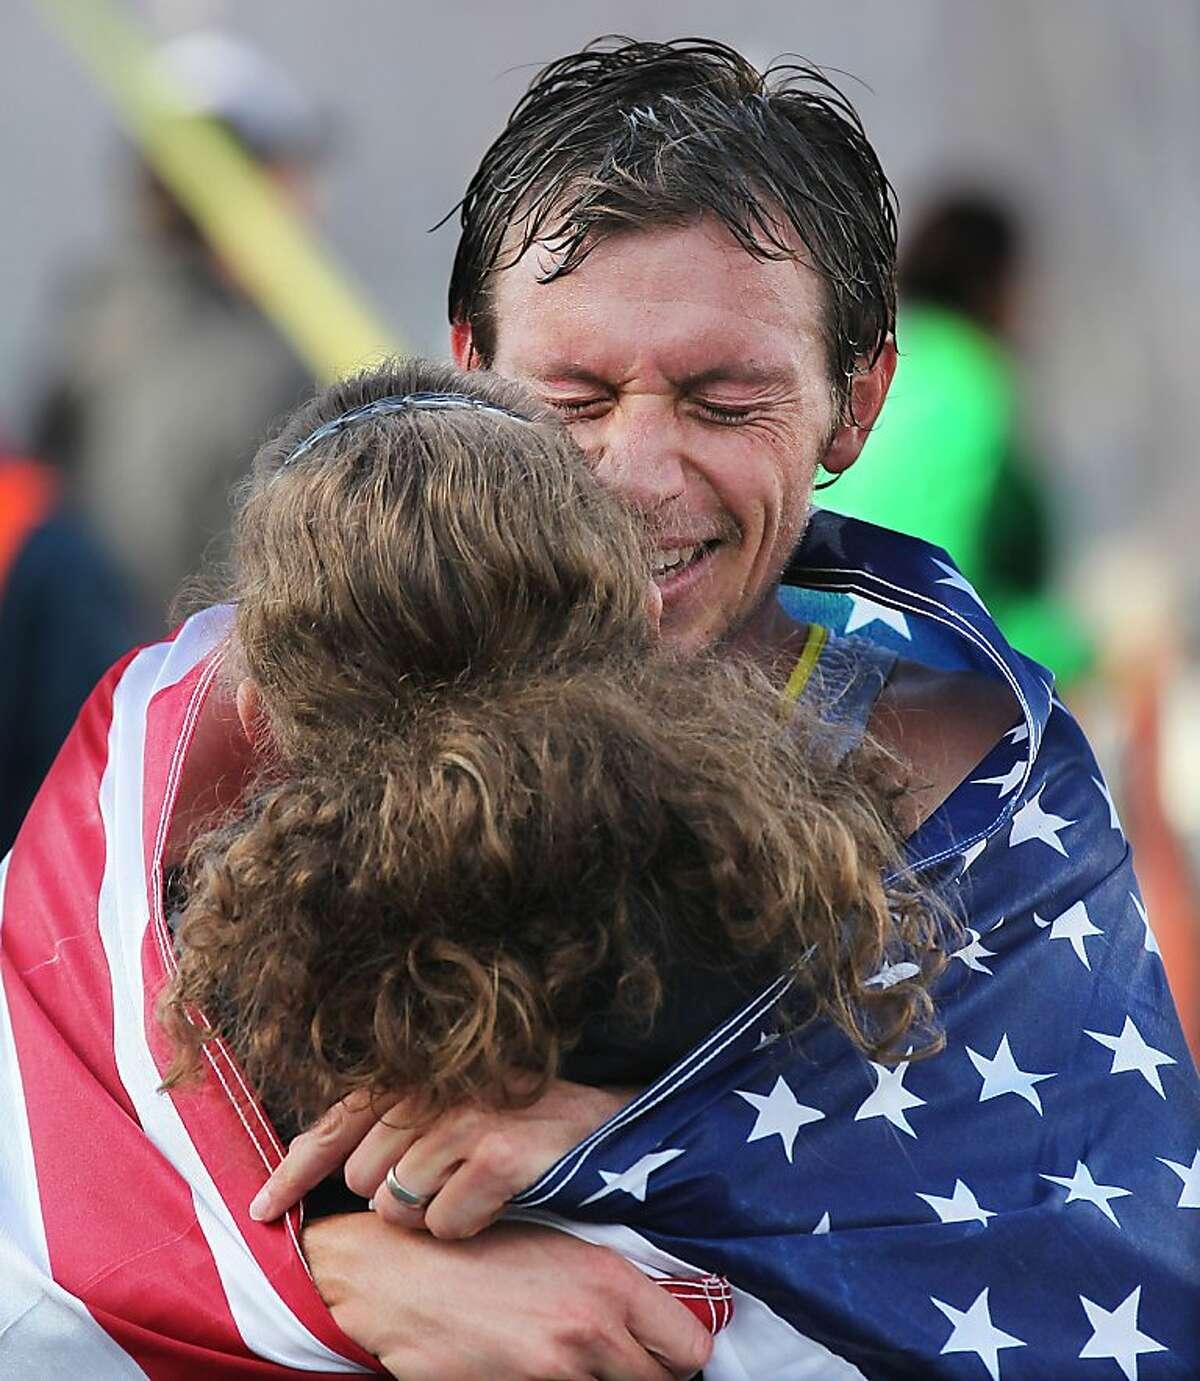 Nicholas Arciniaga, of Flagstaff, Ariz., hugs a supporter after winning the Medtronic Twin Cities Marathon in St. Paul, Minn., Sunday, Oct. 6, 2013. (AP Photo/Andy Clayton-King)